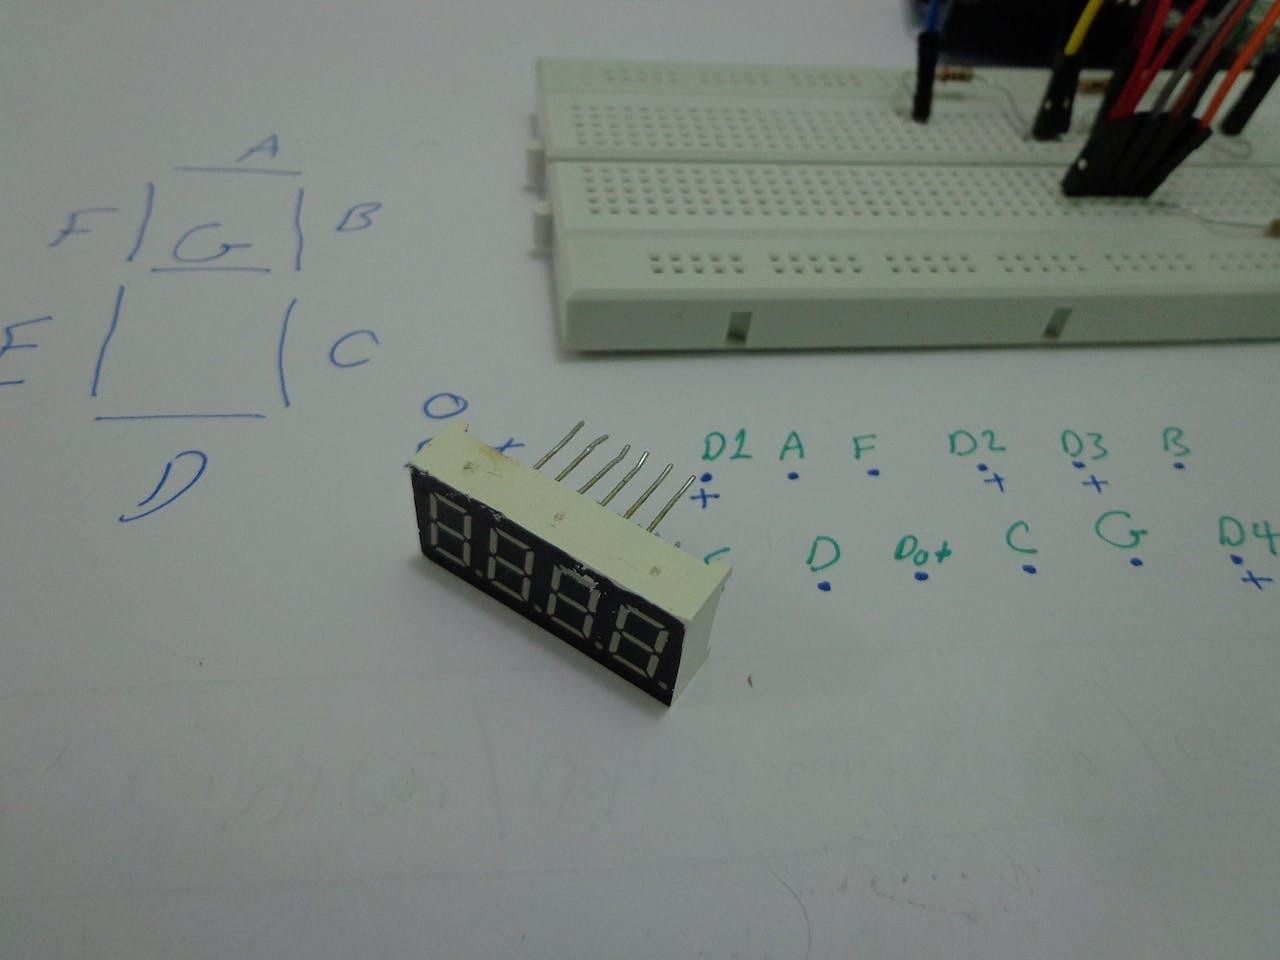 Sevseg Library On 4 Digit Anode Segment Arduino Project Hub Led Tachometer Circuit